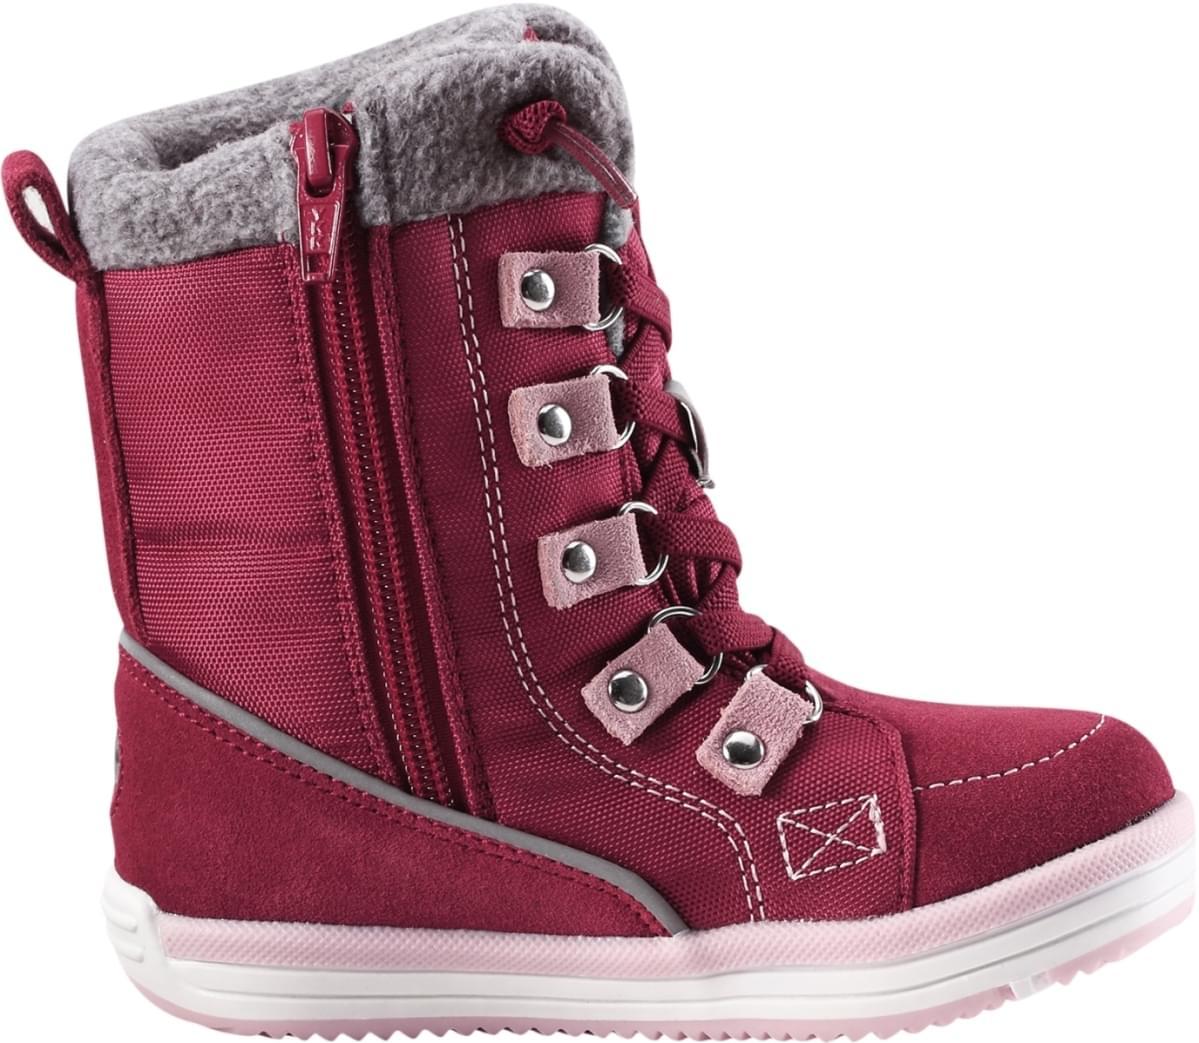 Dětské zimní boty Reima Freddo Toddler - Dark berry - Skibi Kids ff57ebe388